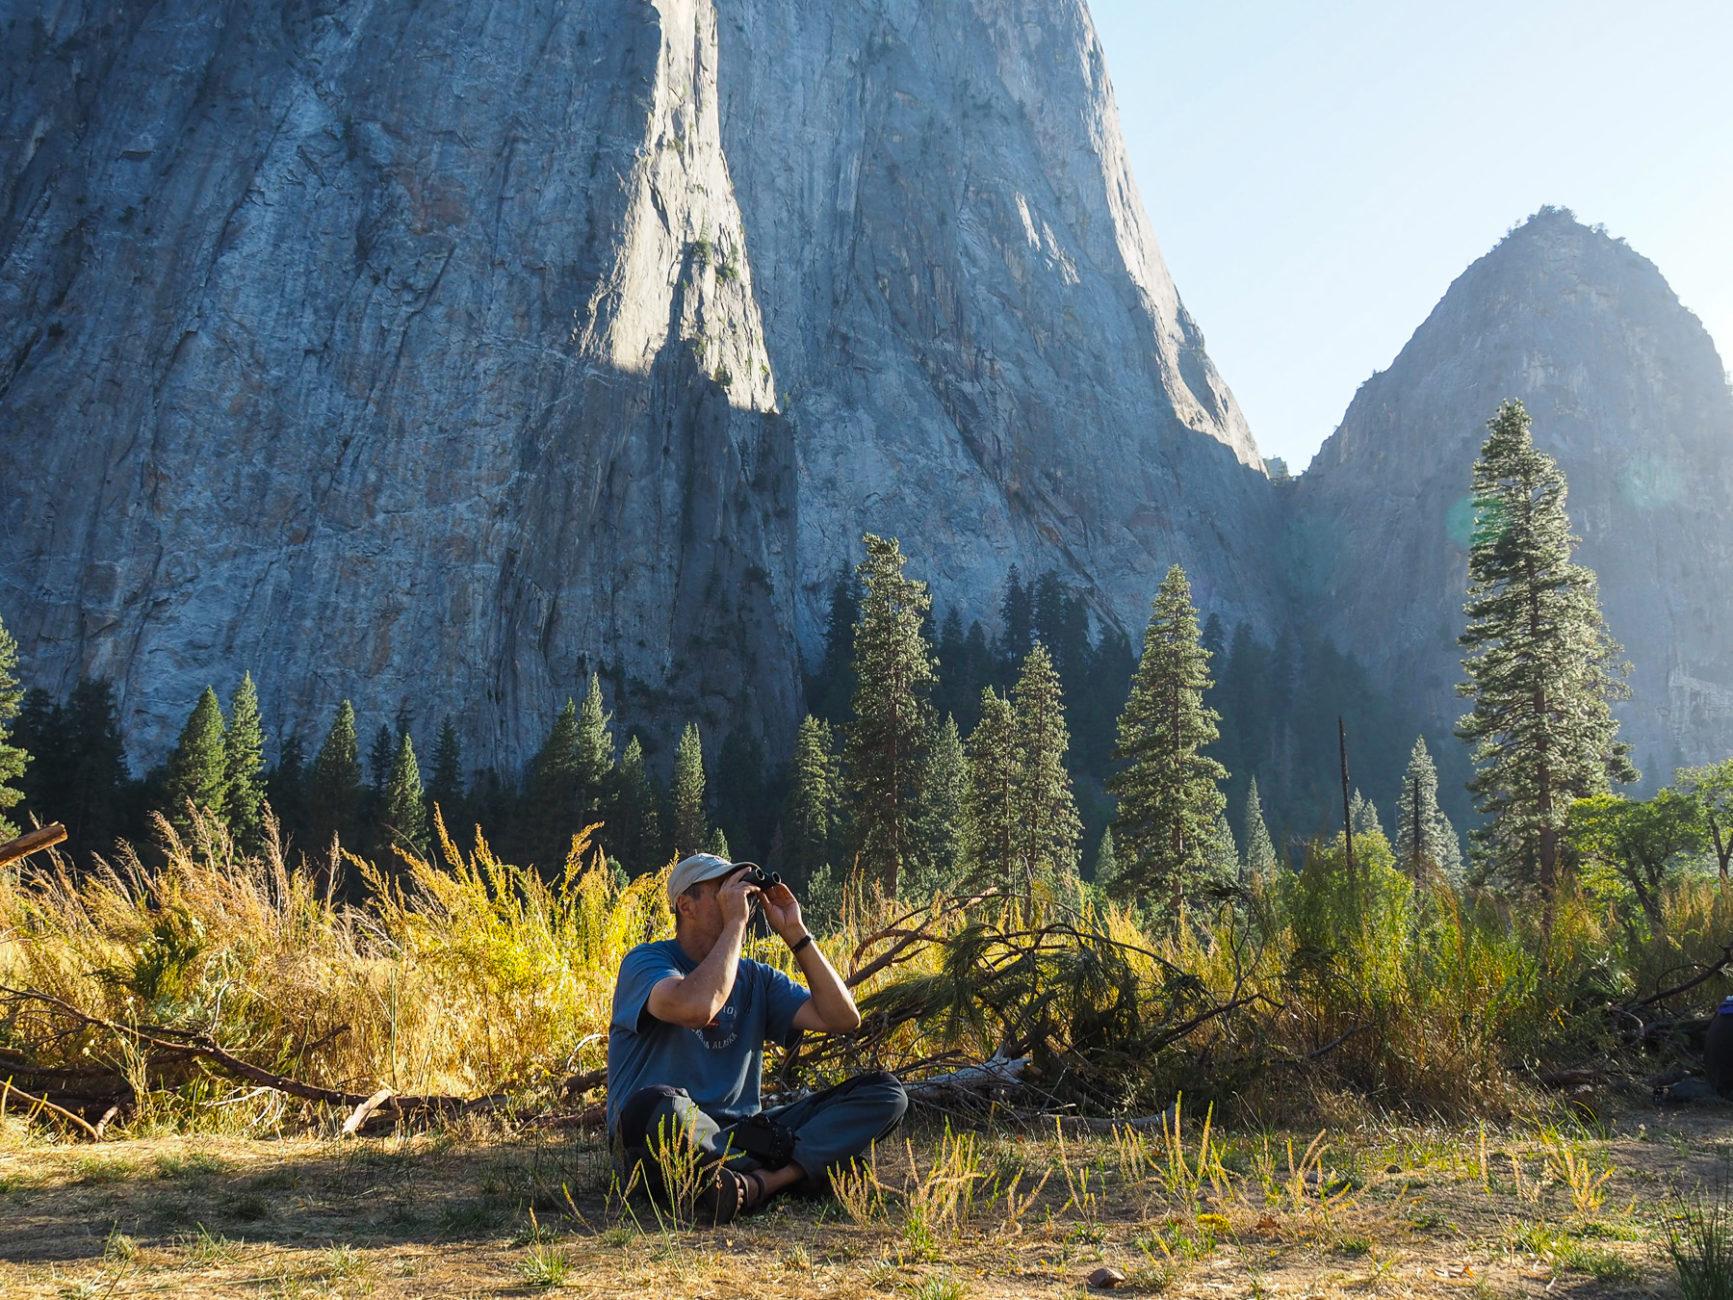 Wir beobachten die Kletterer am El Capitan